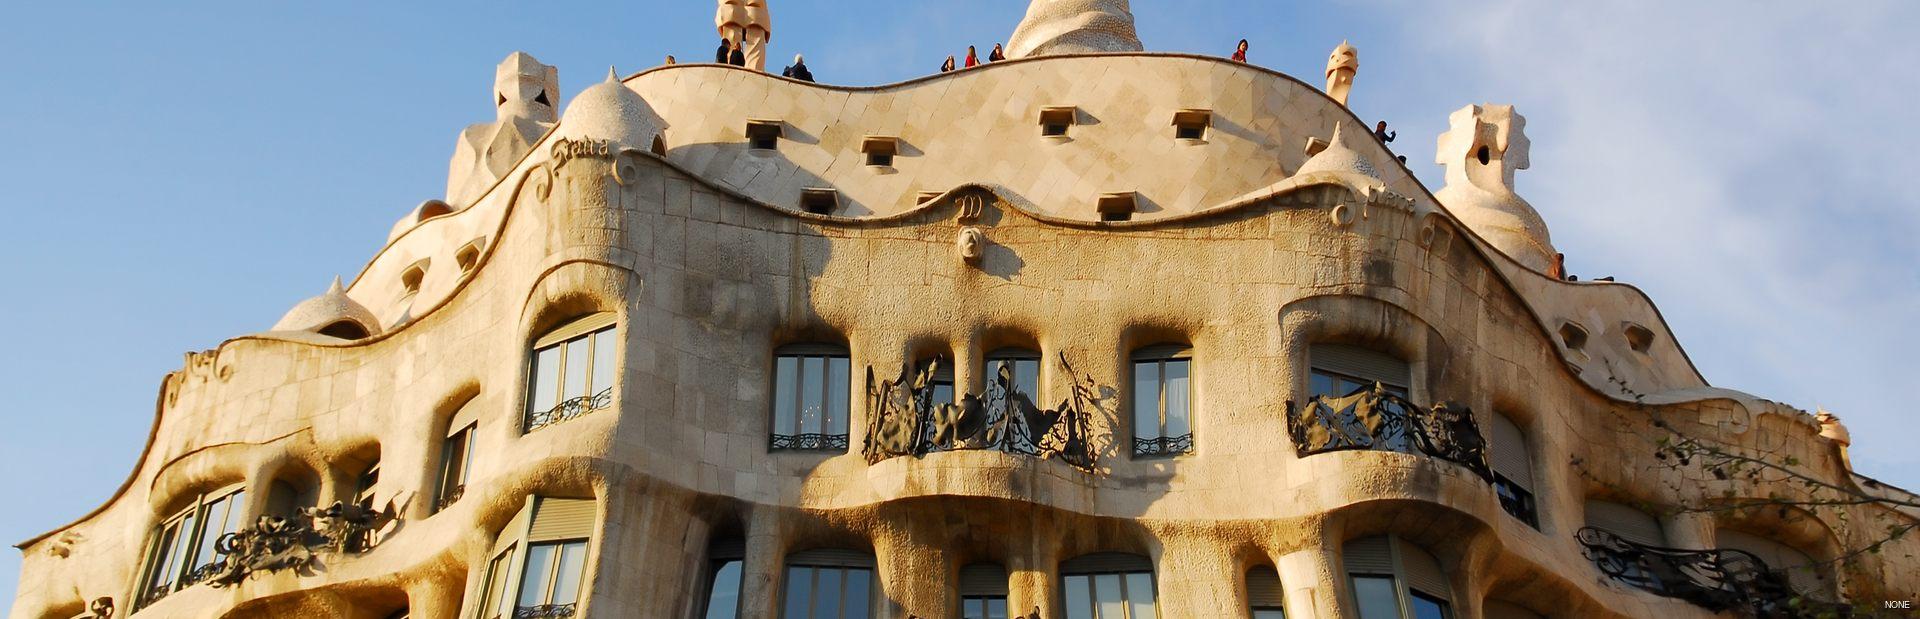 Barcelona photo tour